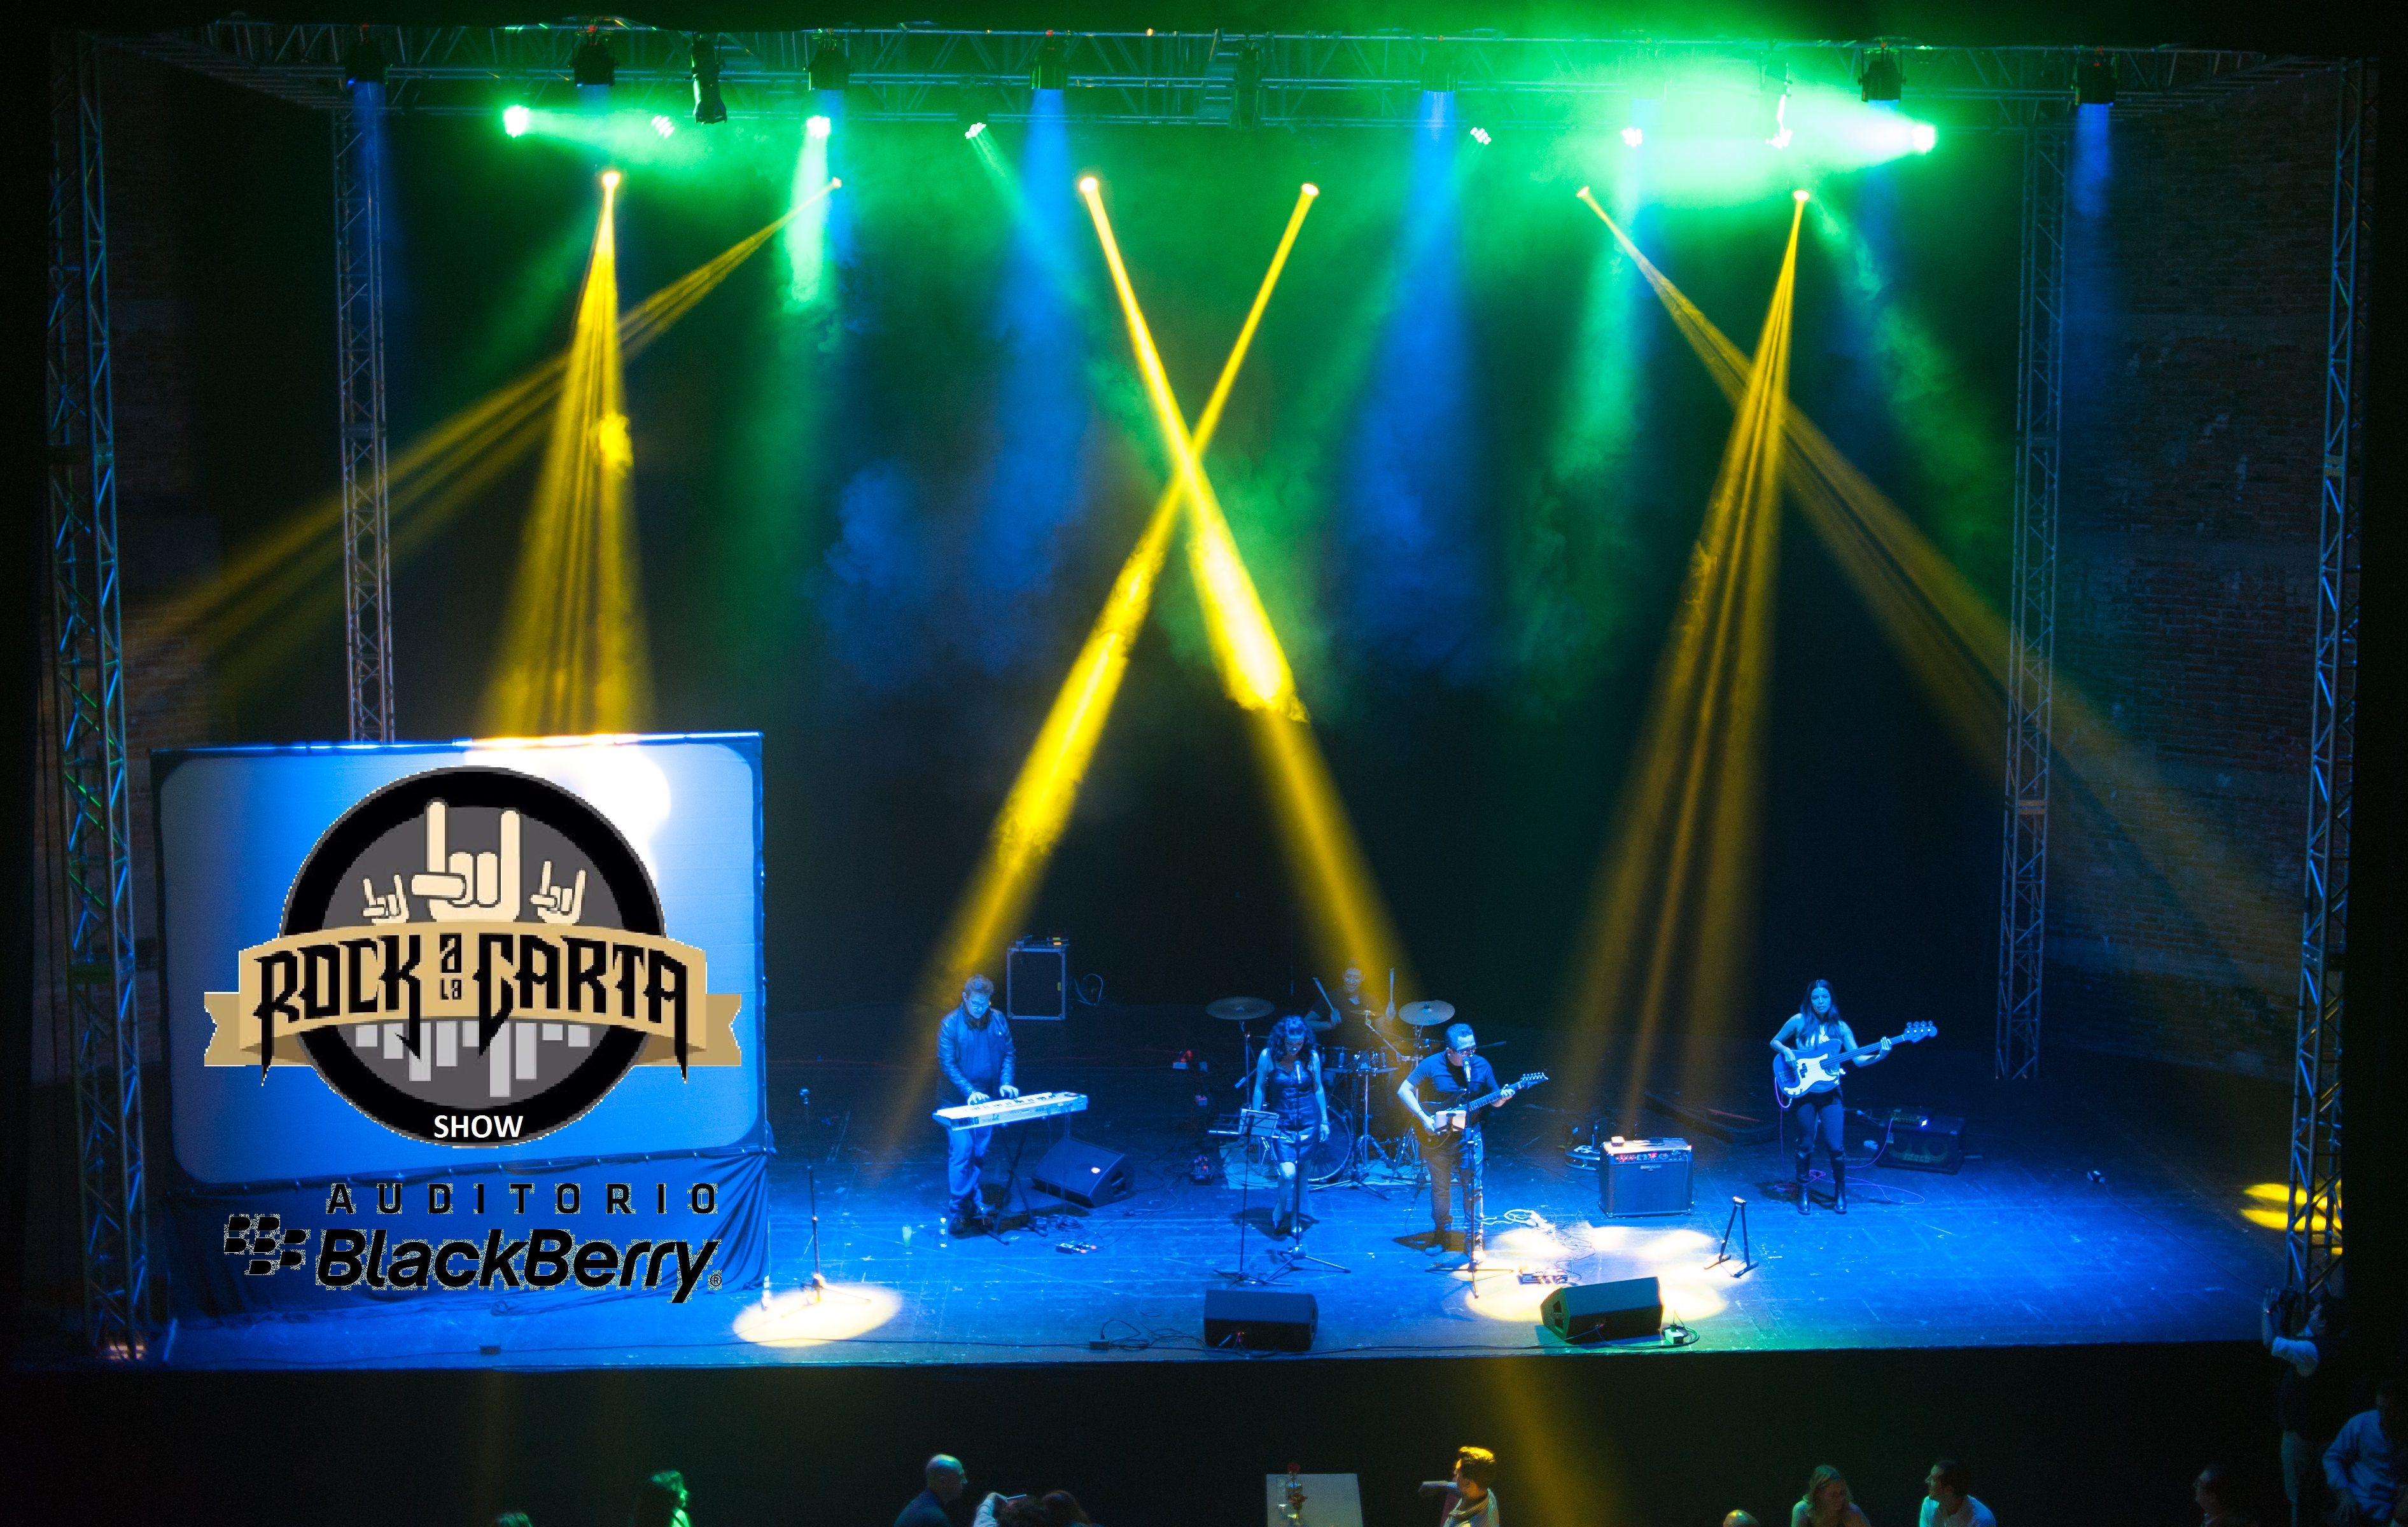 rock-a-la-carta-auditorio-blackberry